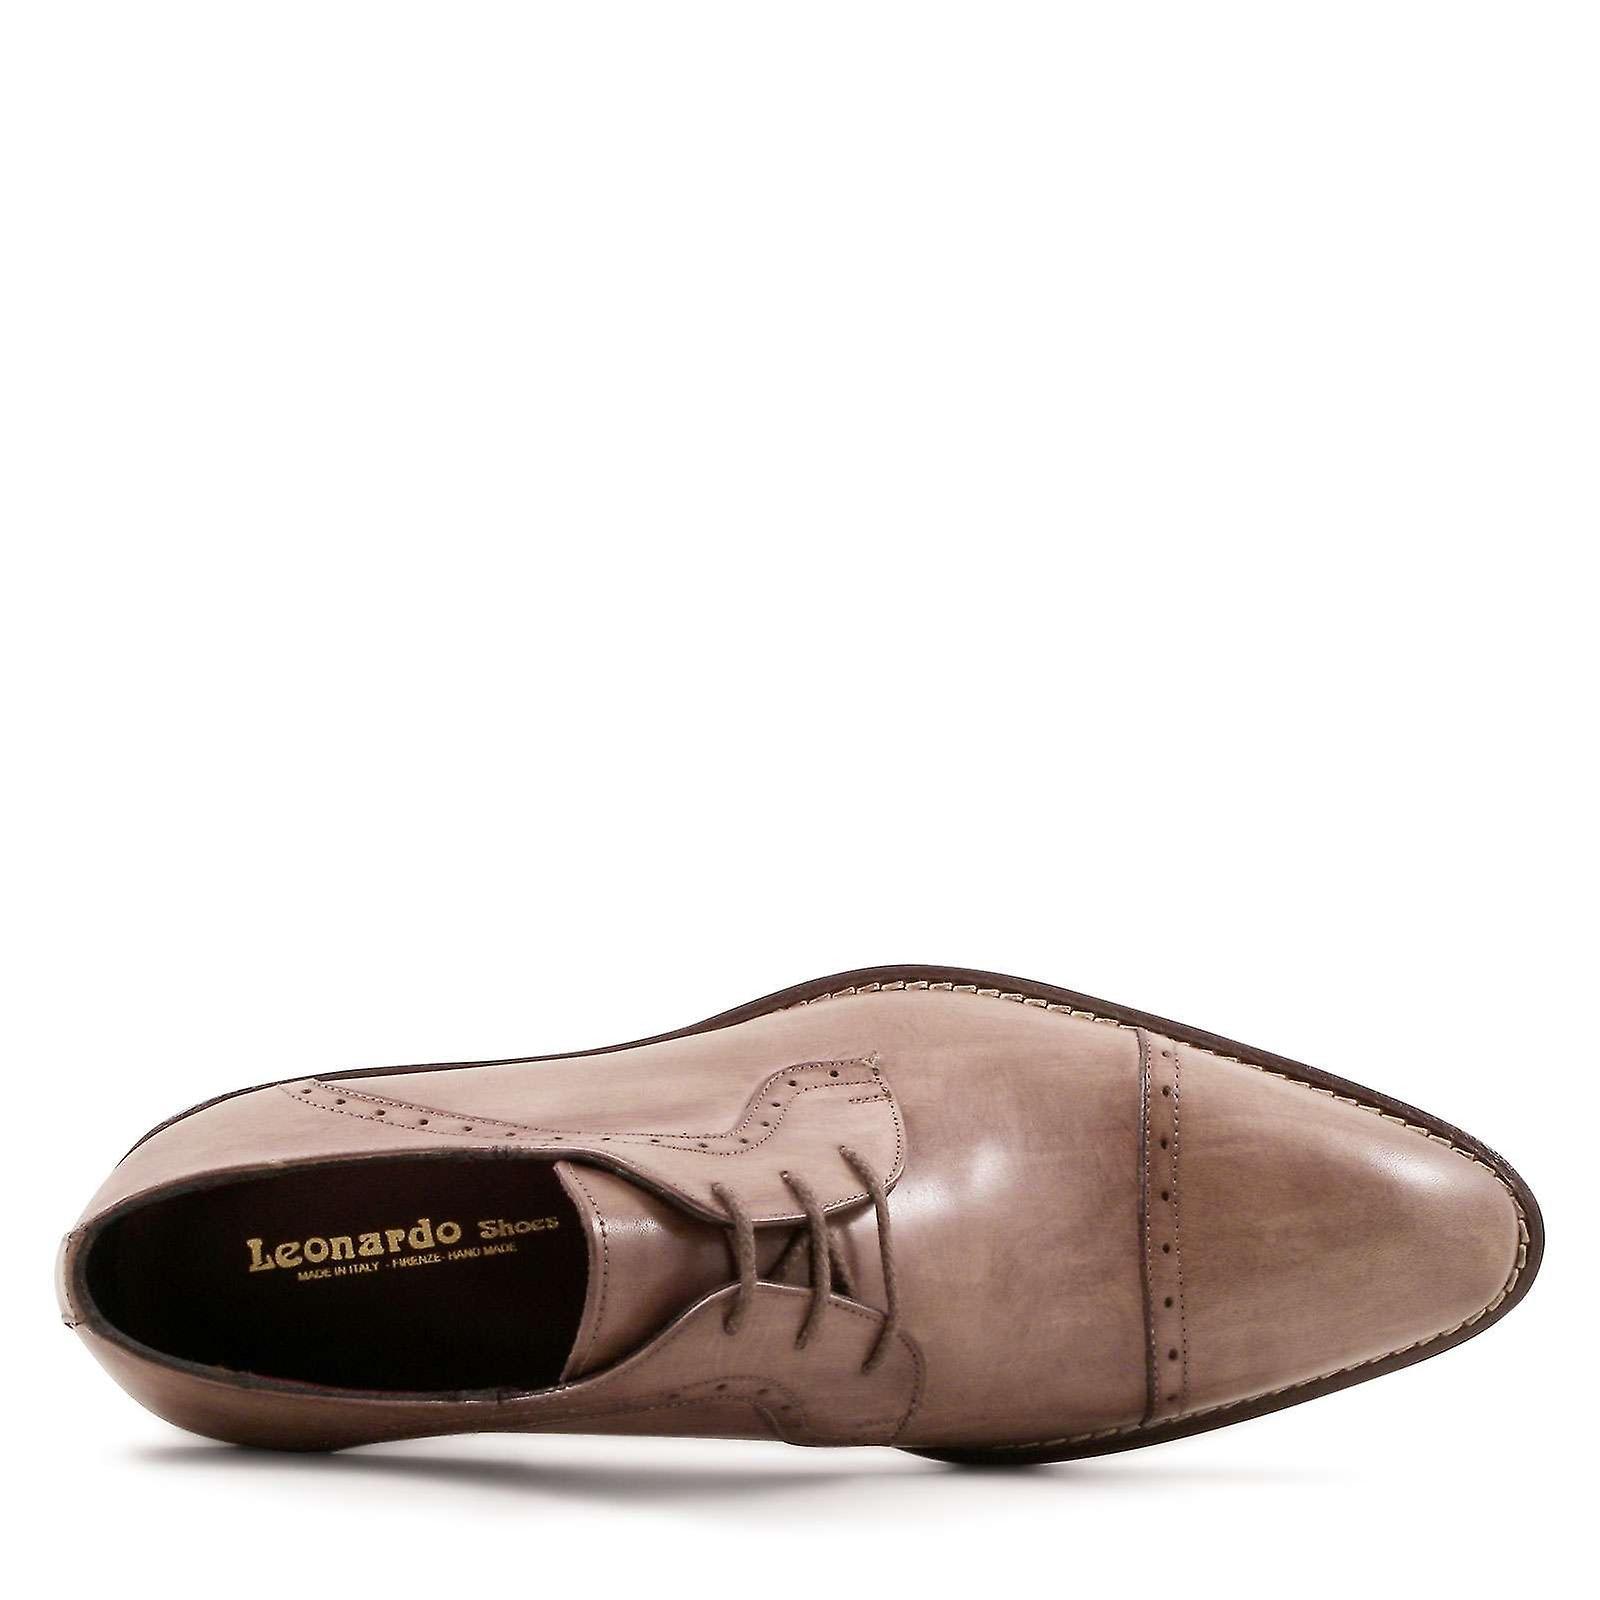 ac8bc127ecd ... Handmade Handmade Handmade semi brogues derby shoes for men 157842 ...